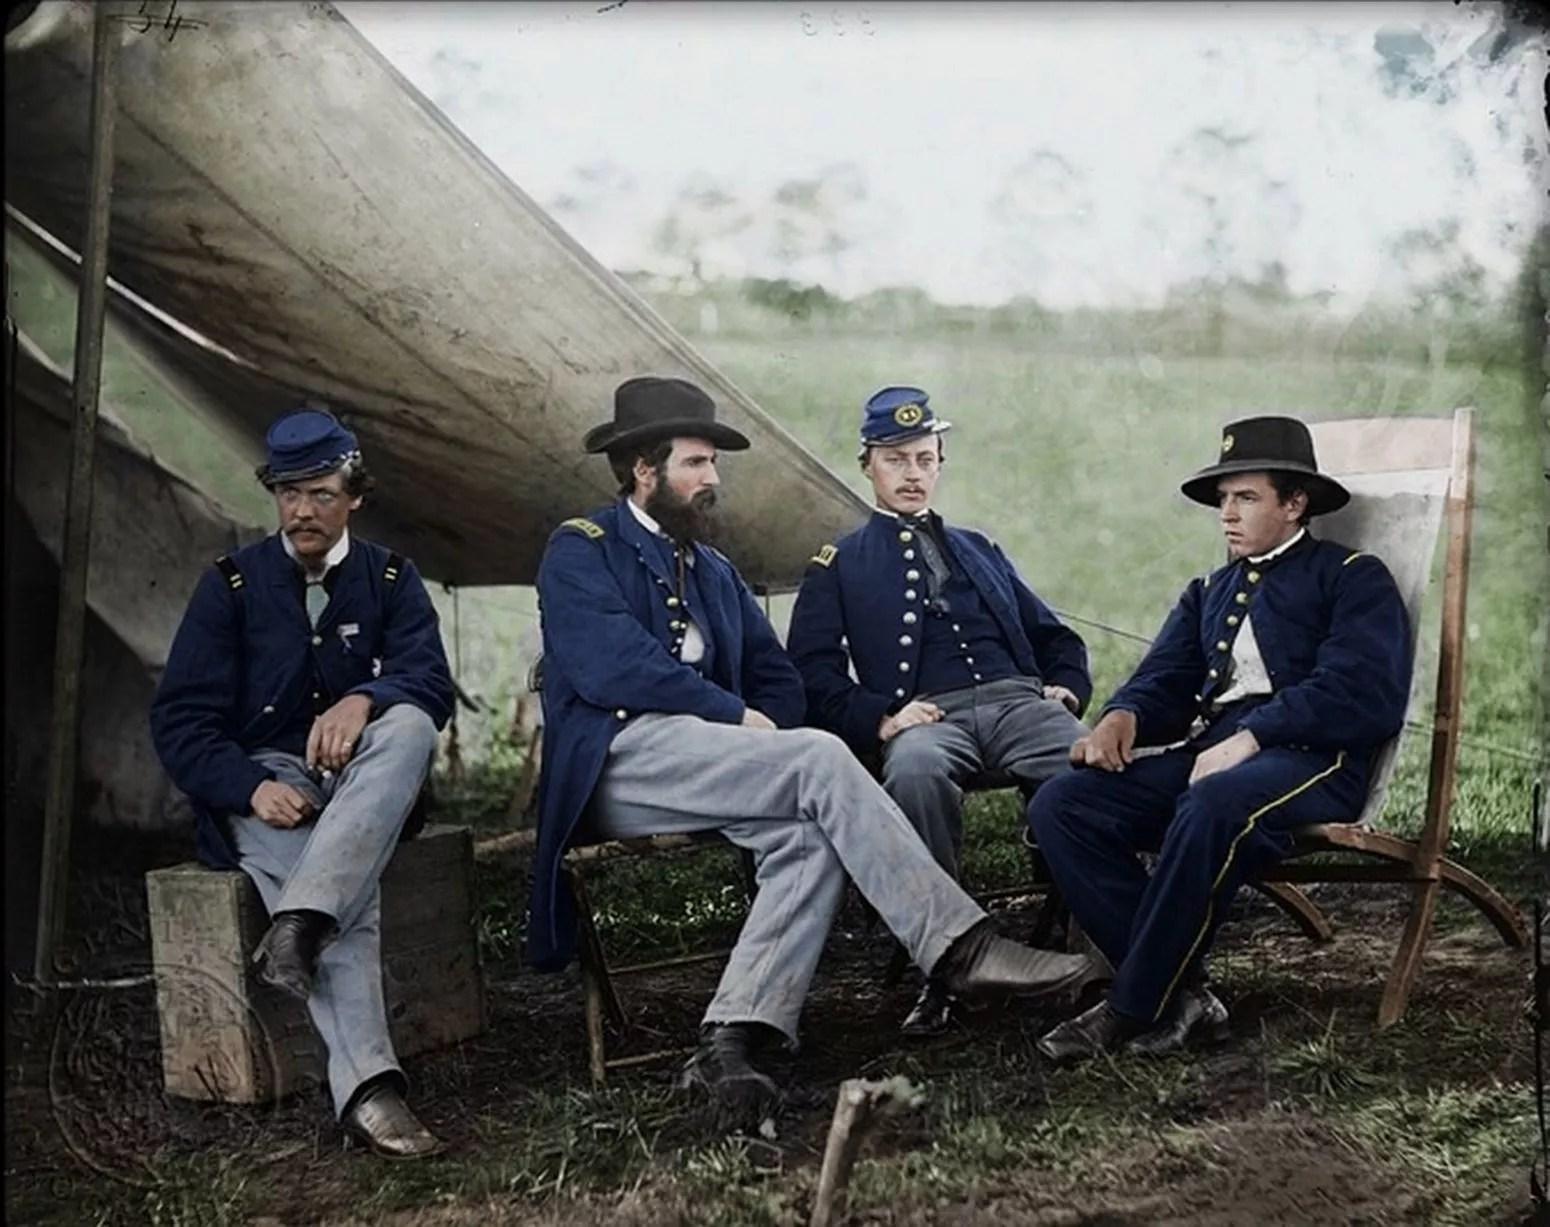 American Civil War Brought Back To Life Through Stunning